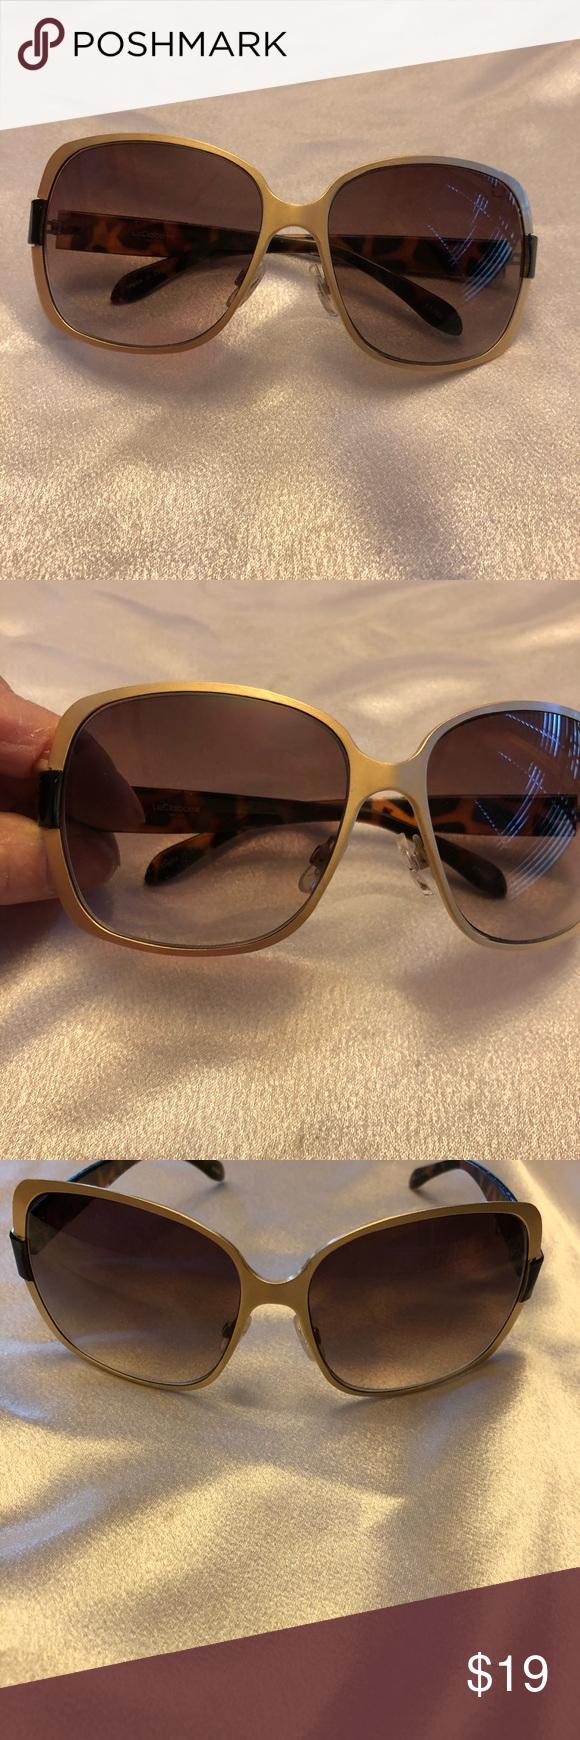 Liz Claiborne L357 Petite Single Vision Full Frame